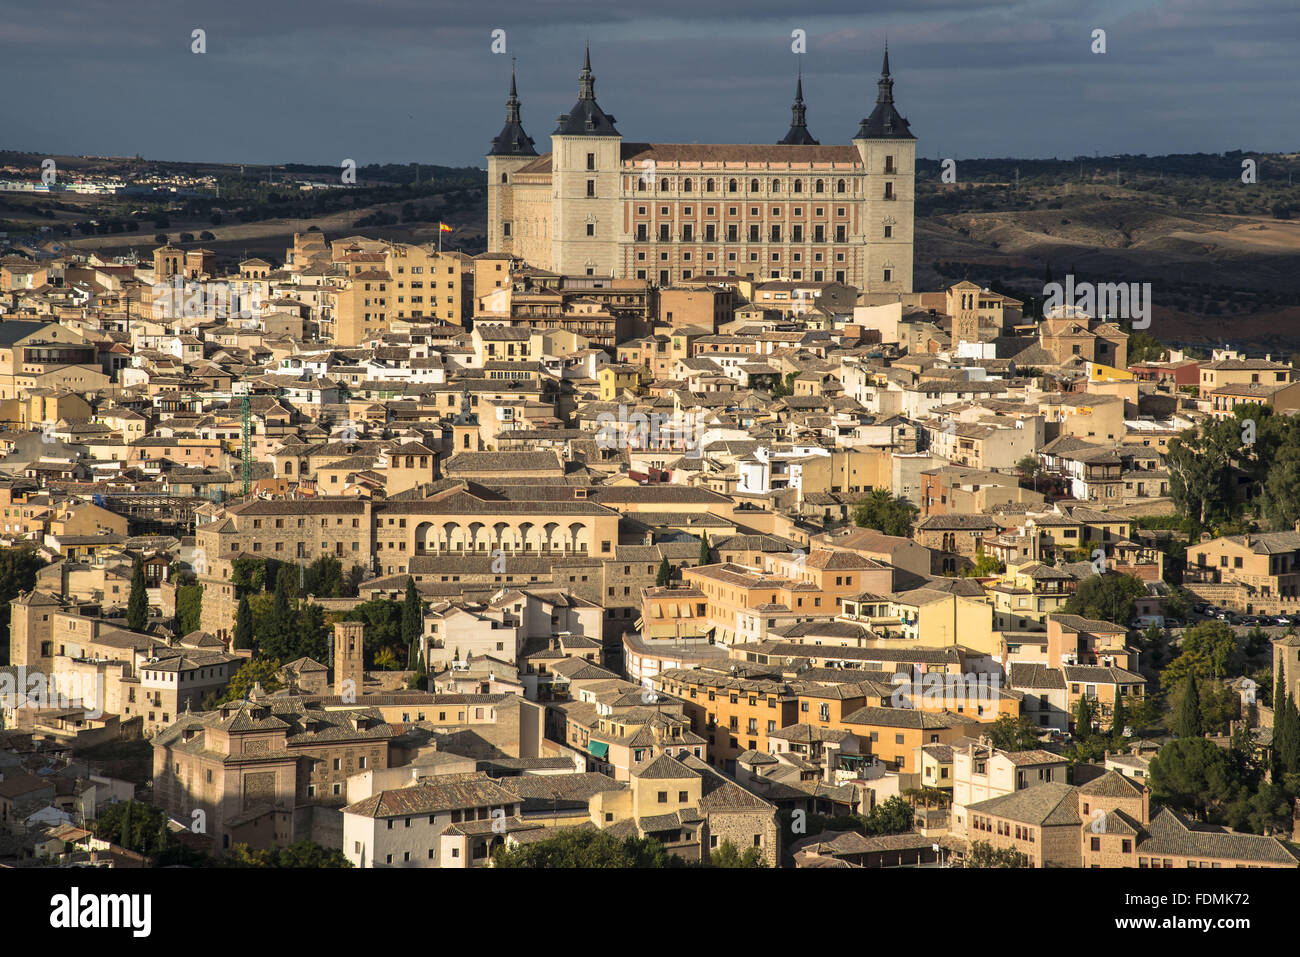 Panoramic view of the city - the region of Castilla - La Mancha - Stock Image